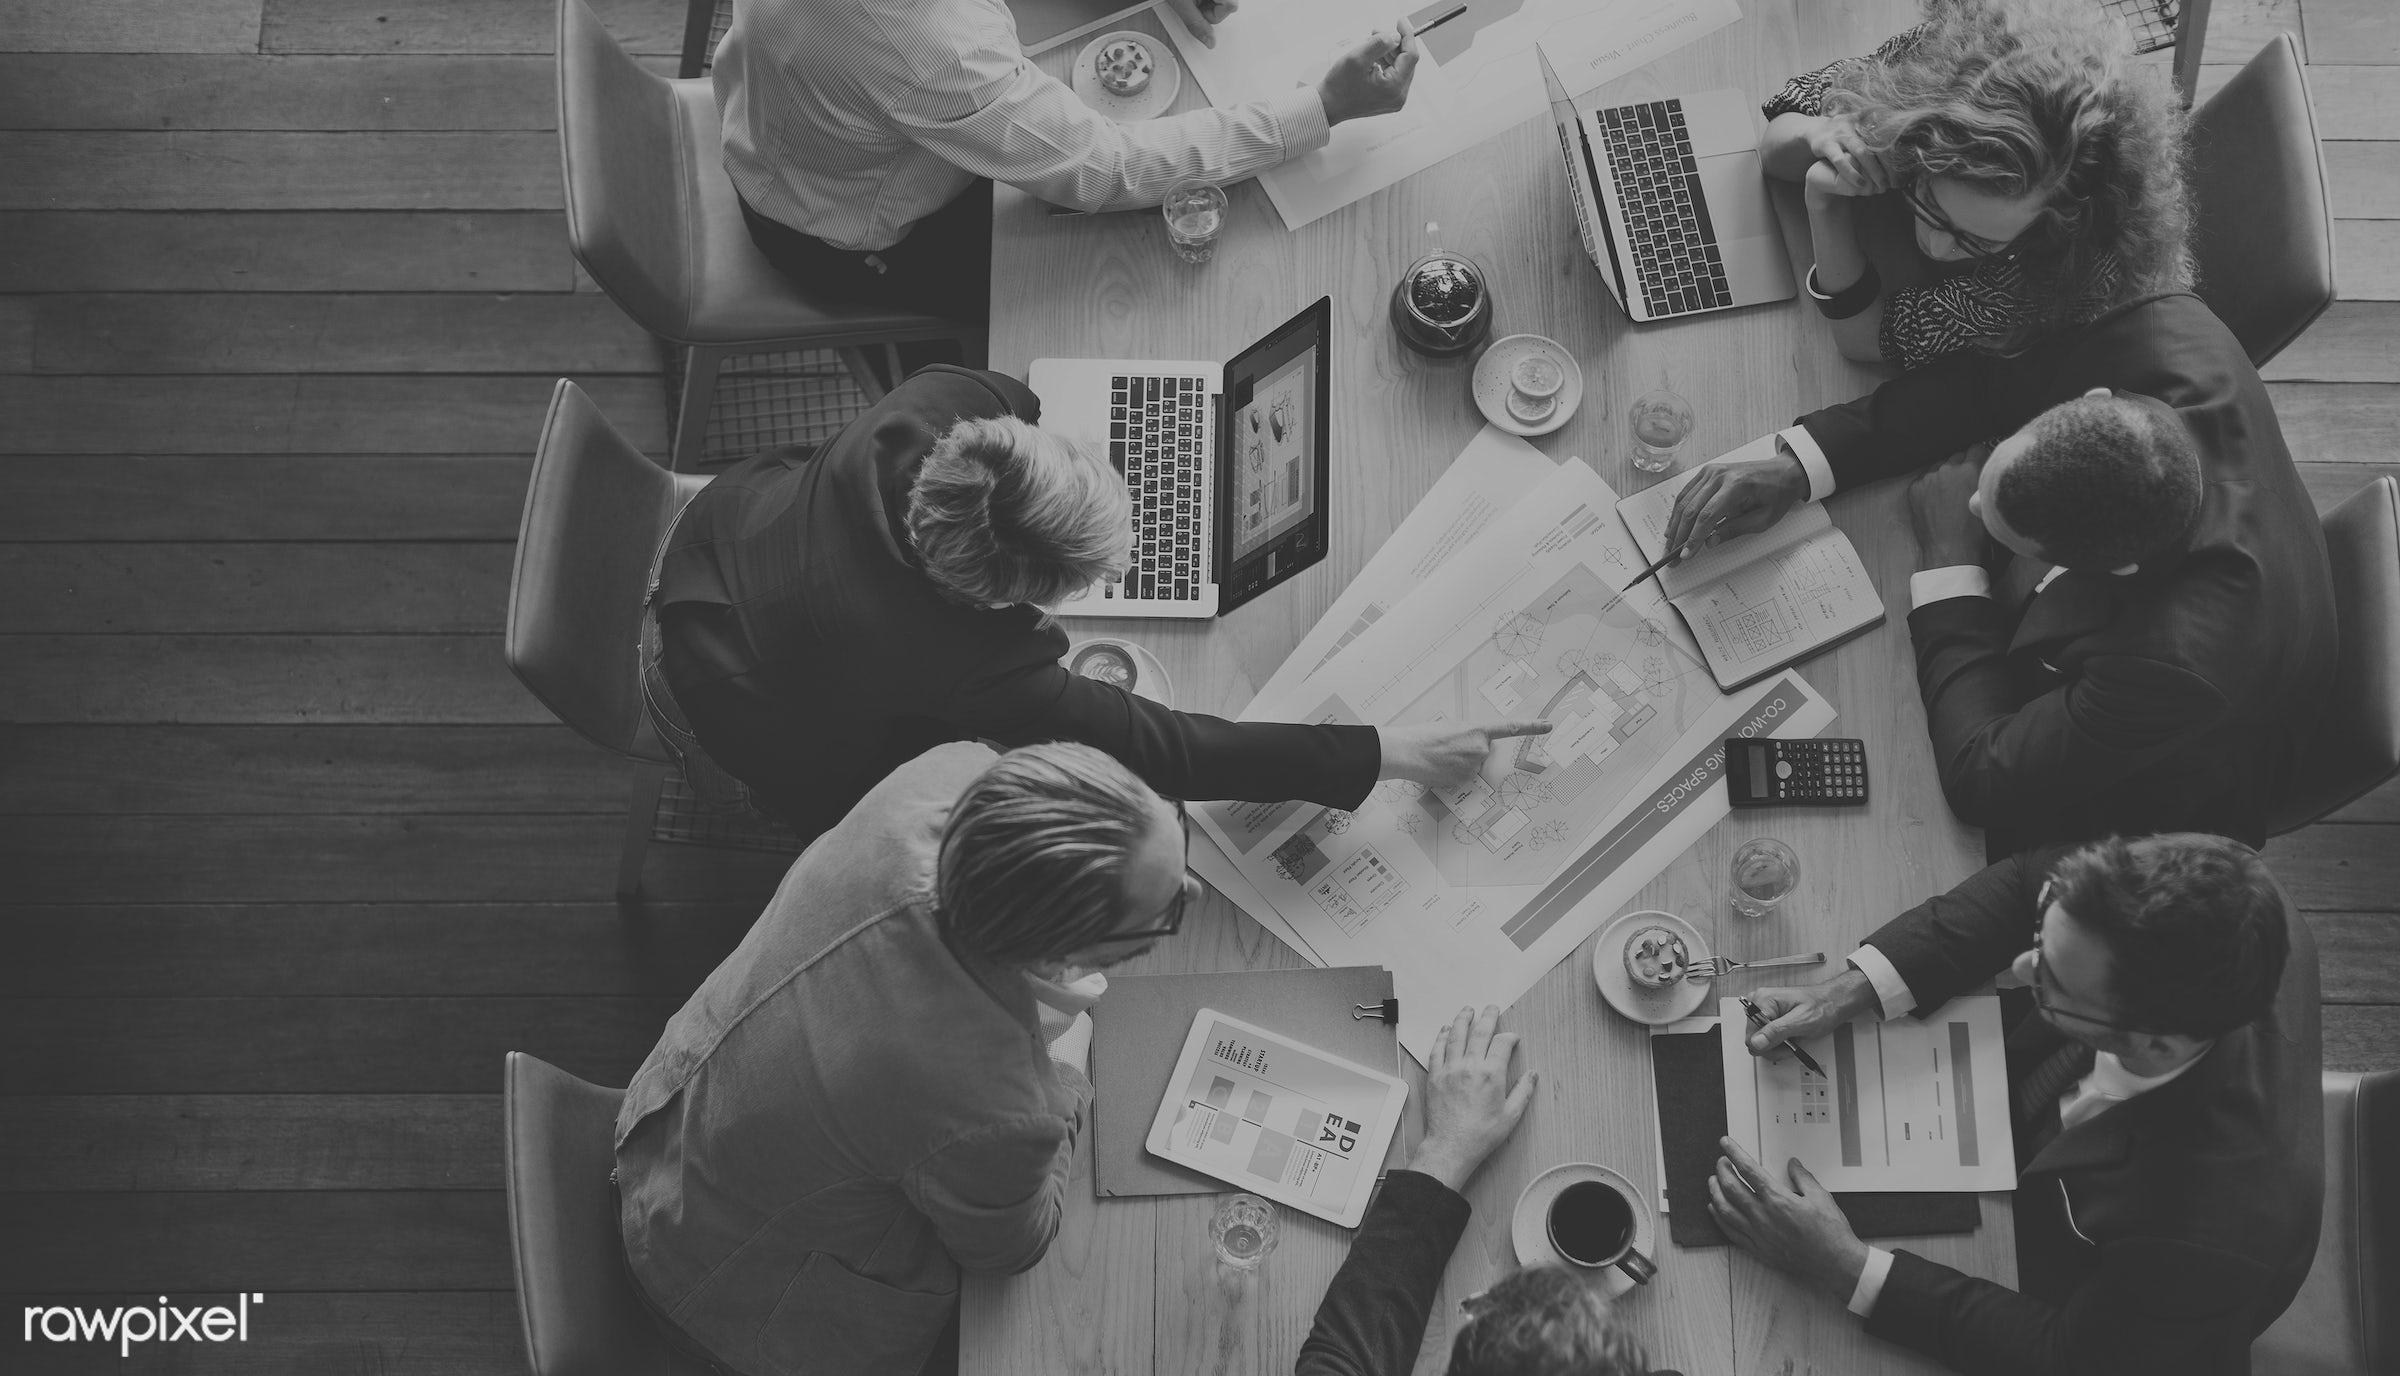 analysing, analyze, analyzing, bar graph, brainstorming, business, business chart, business plan, businessmen, businesswomen...